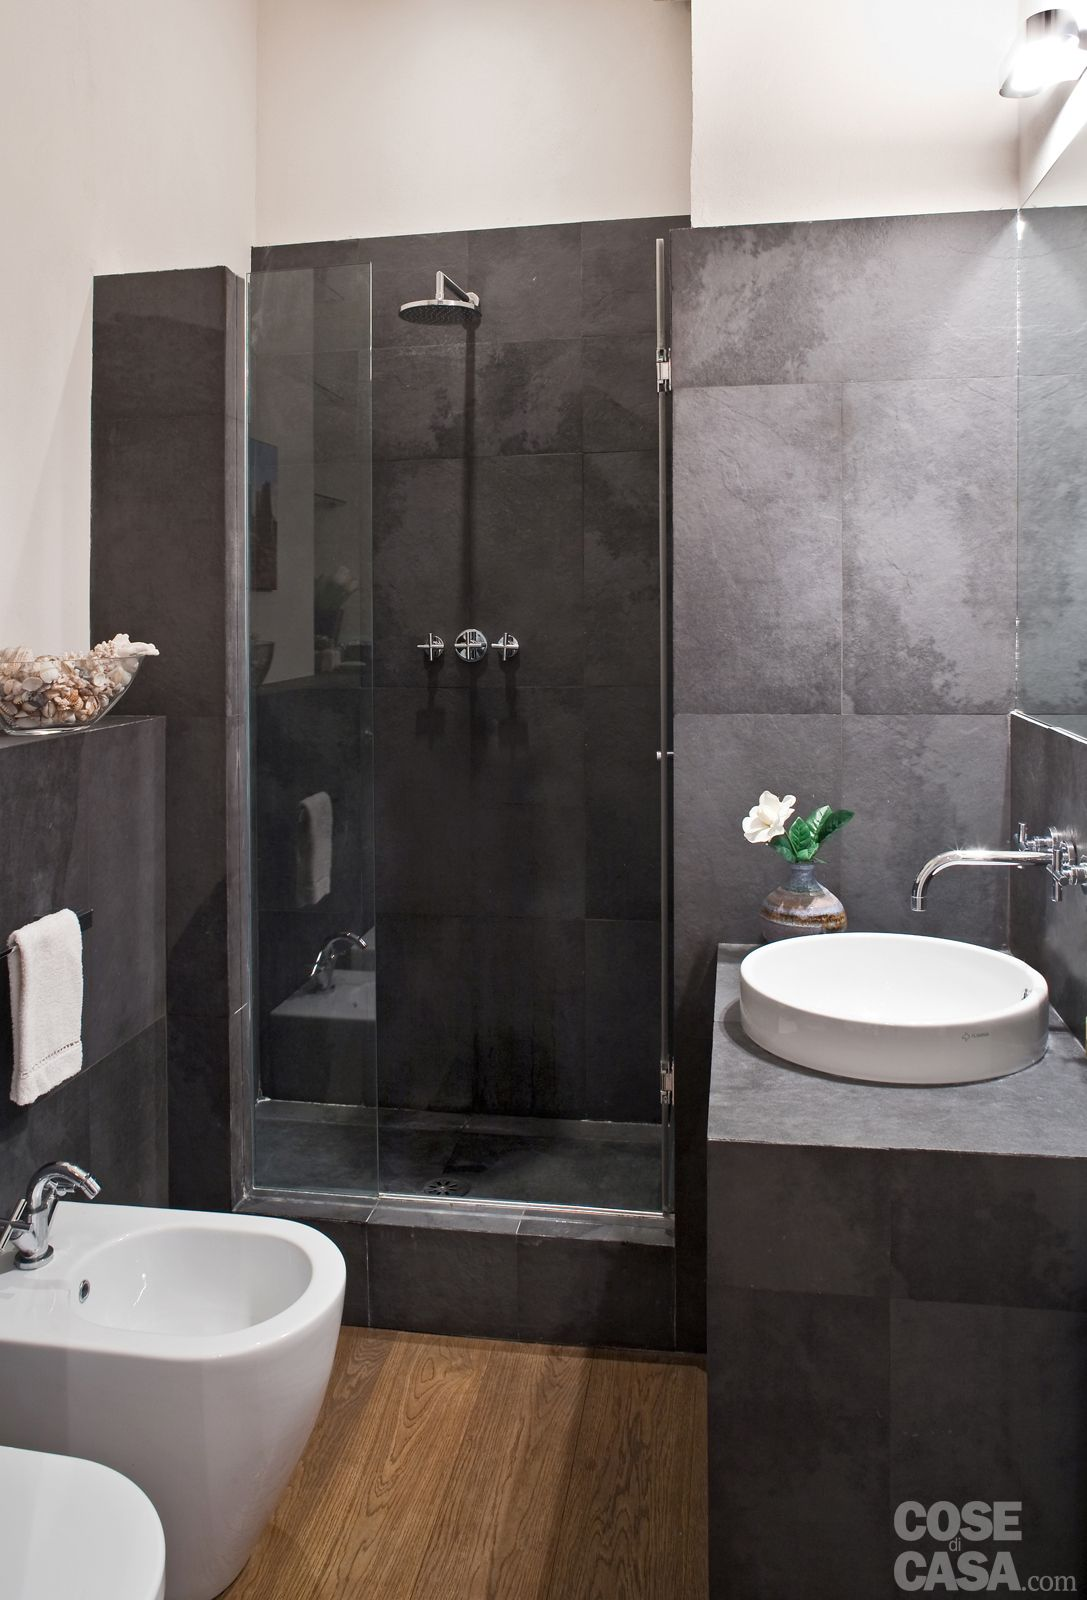 Idee per bagno in camera con doccia cerca con google ba os bathrooms pinterest ba o - Bagno in camera moderno ...